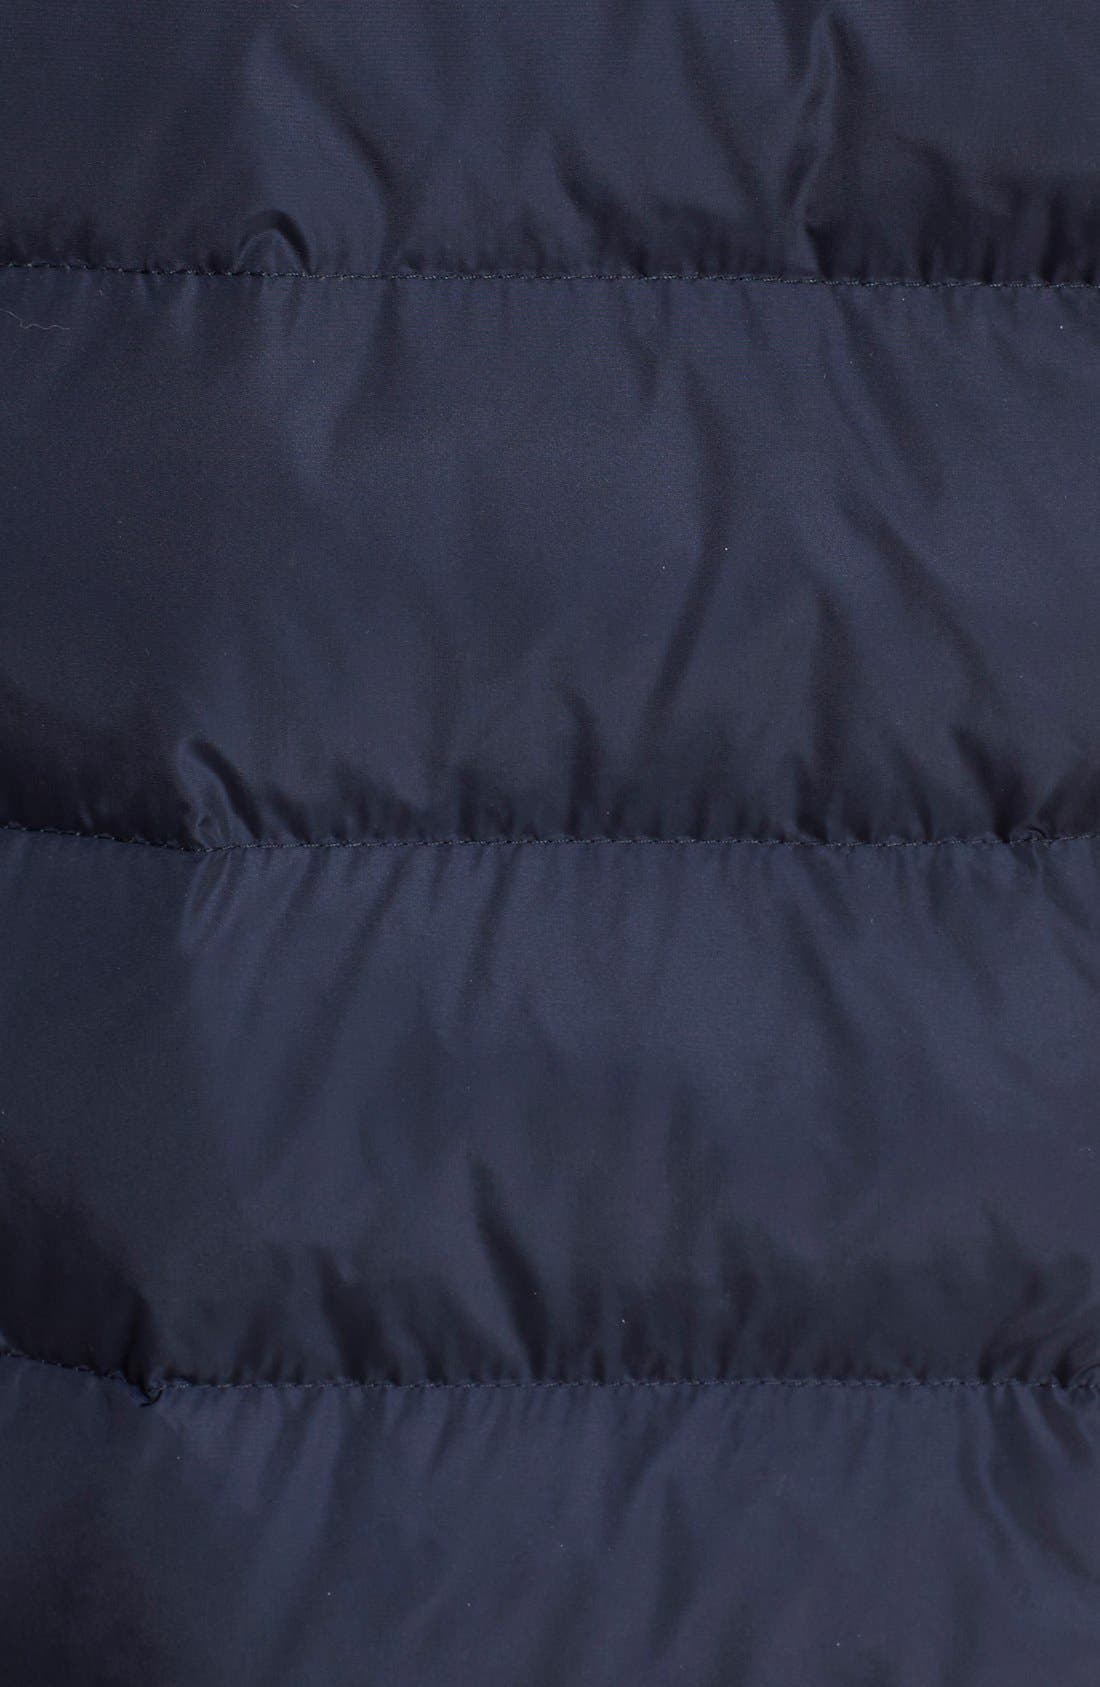 'Elestoria' Two-Piece Down Puffer Coat with Genuine Fox Fur Trim,                             Alternate thumbnail 10, color,                             419